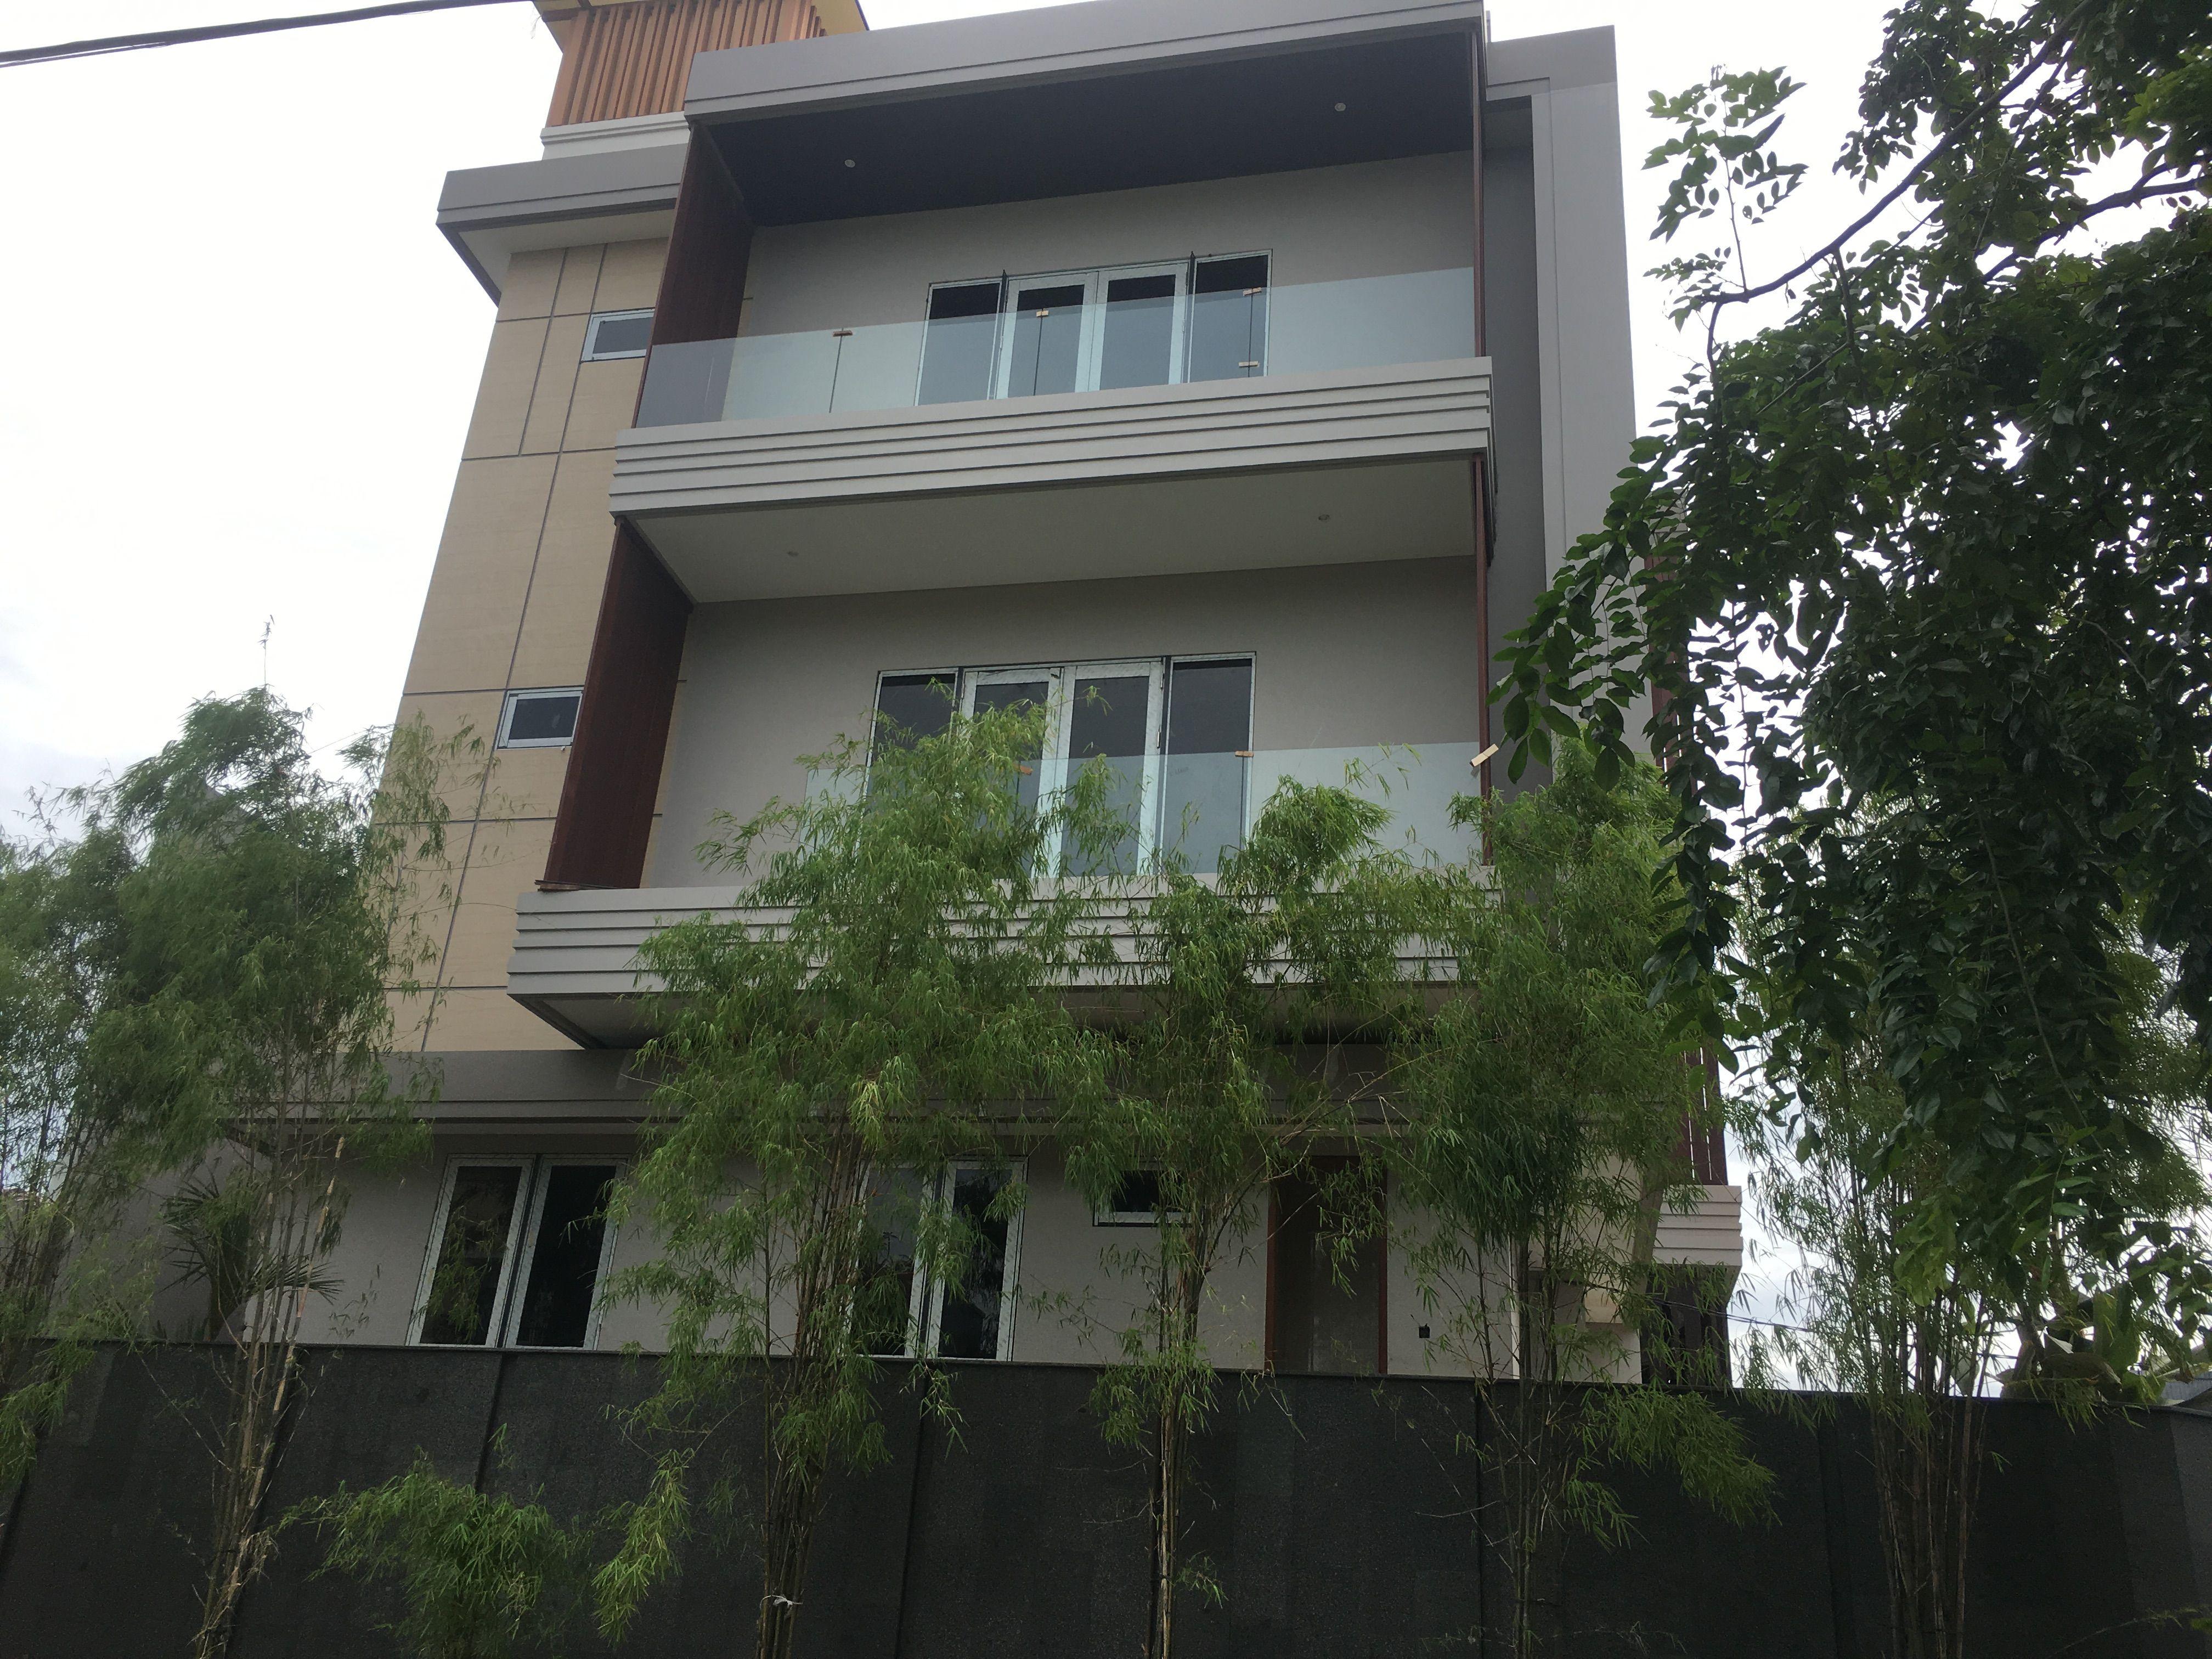 Desan balkon minimalis ini bikin rumah terlihat elegant!  #designinterior #rumahmodern #design #aesthetic #jasakaca #interior #kacaruma #kacarumah #jakarta #inspirasicafe #minimalis #desainrumahminimalis #eksterior #kacarumahminimalis #kacarumahminimalis #desaininteriorrumah #dekorumahyuk #desainrumahidaman #rumahfavorit #dekorrumah #estetik #17agustus #balkonrumah #balkonrumahminimalis #inspirasibalkon